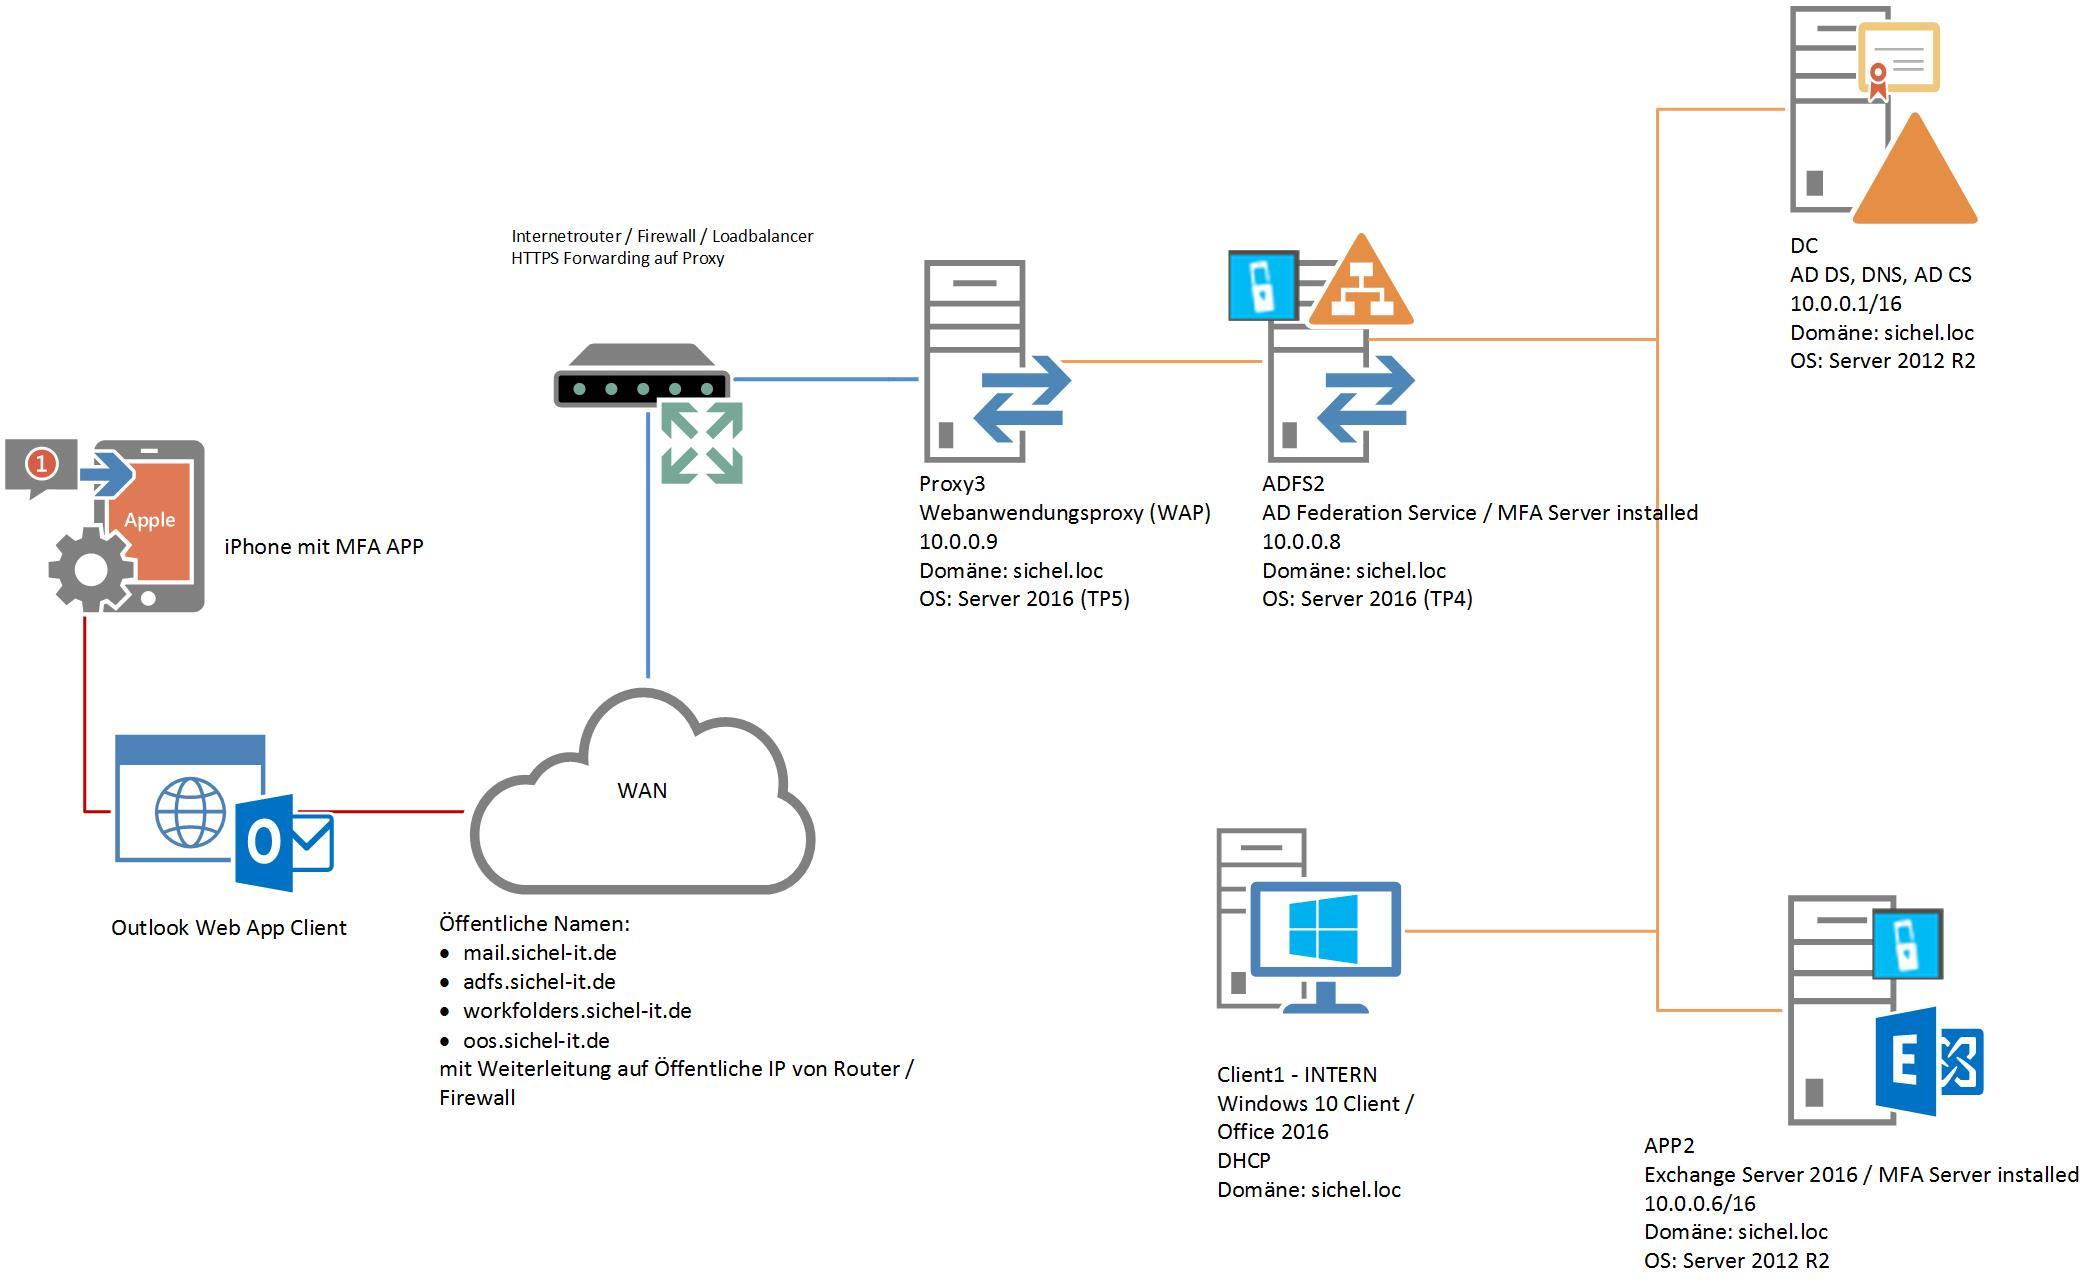 MFA mit Microsoft Authenticator App für Outlook Web App